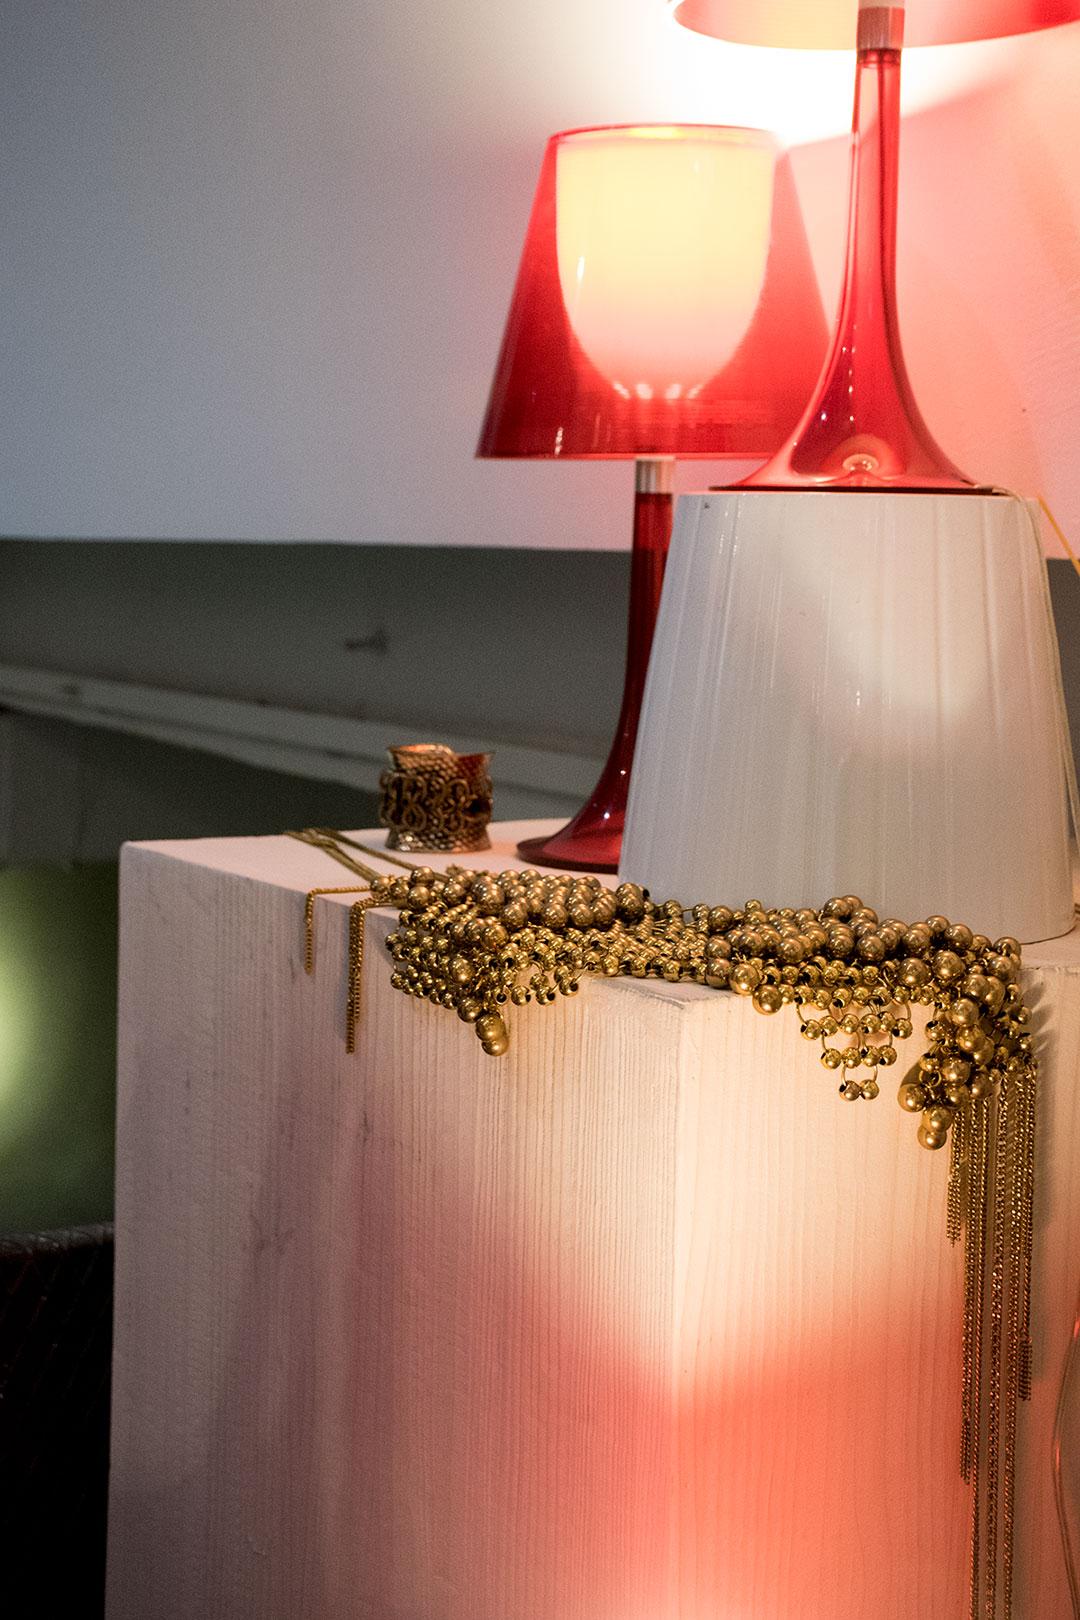 ulises-merida-atelier-mitmeblog-web-14